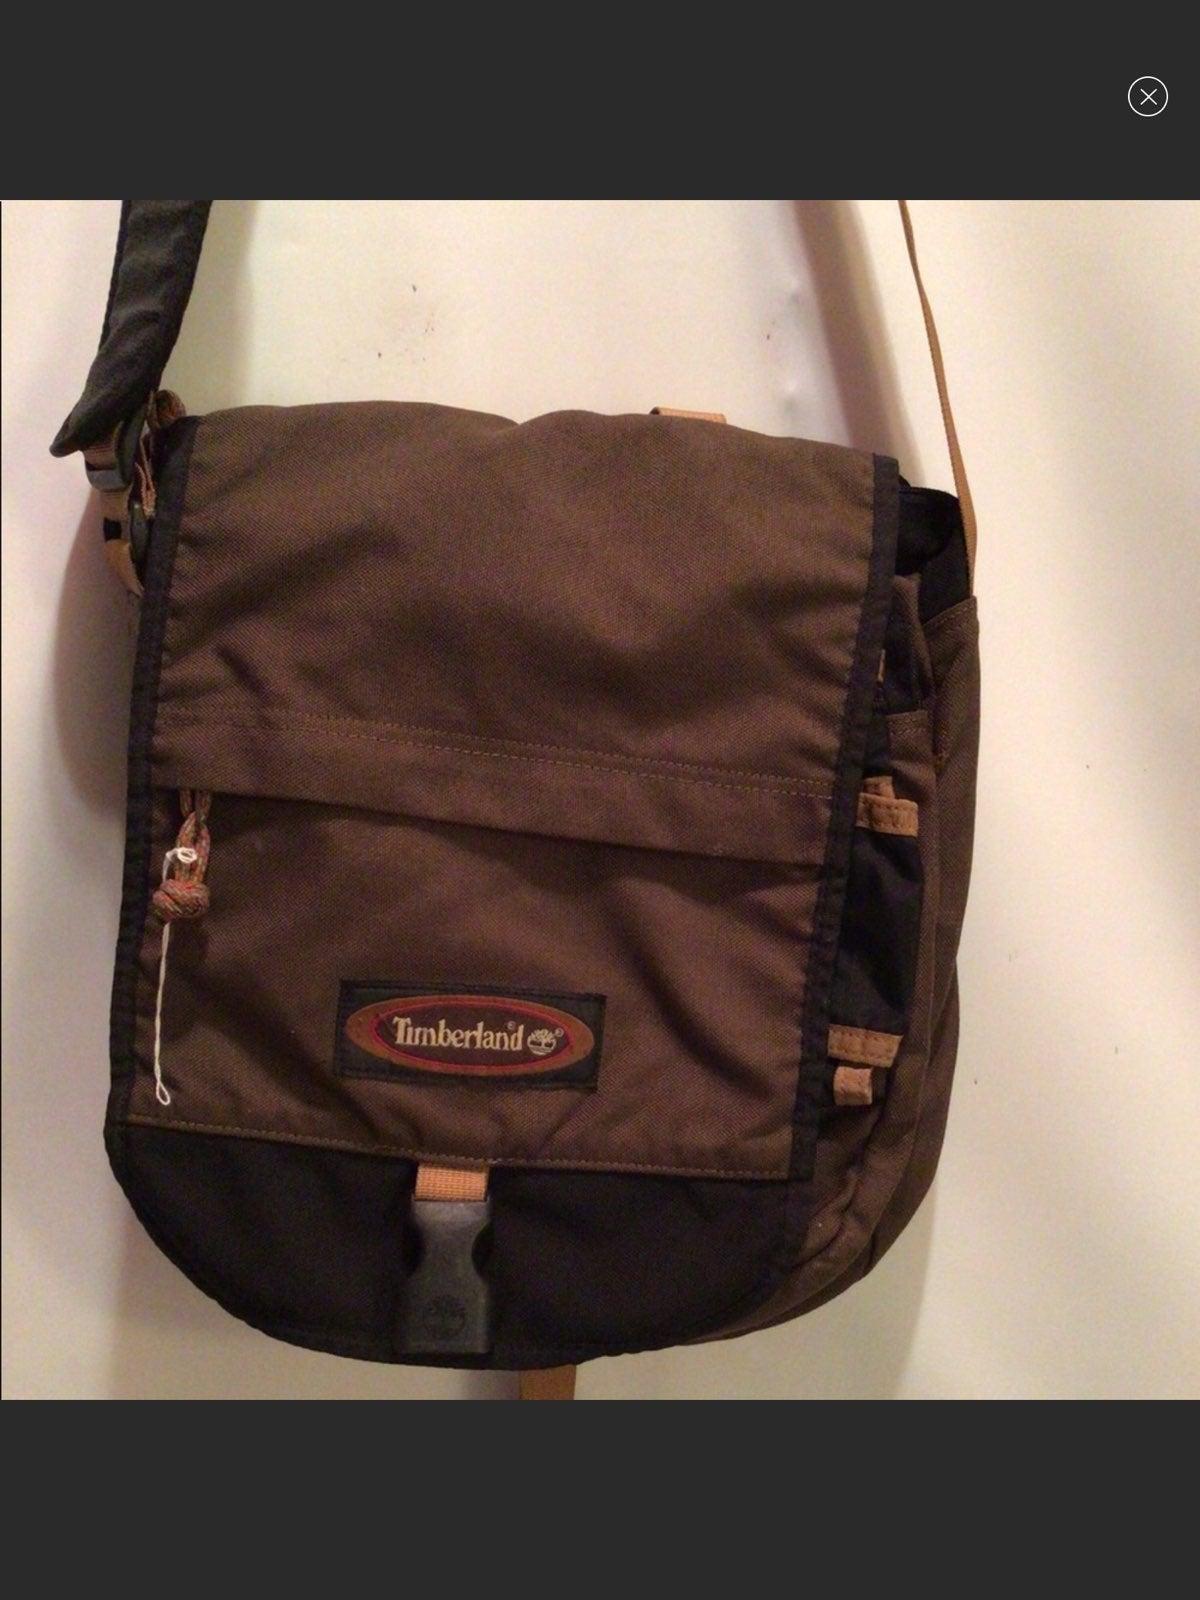 Timberland Unisex Messenger Bag